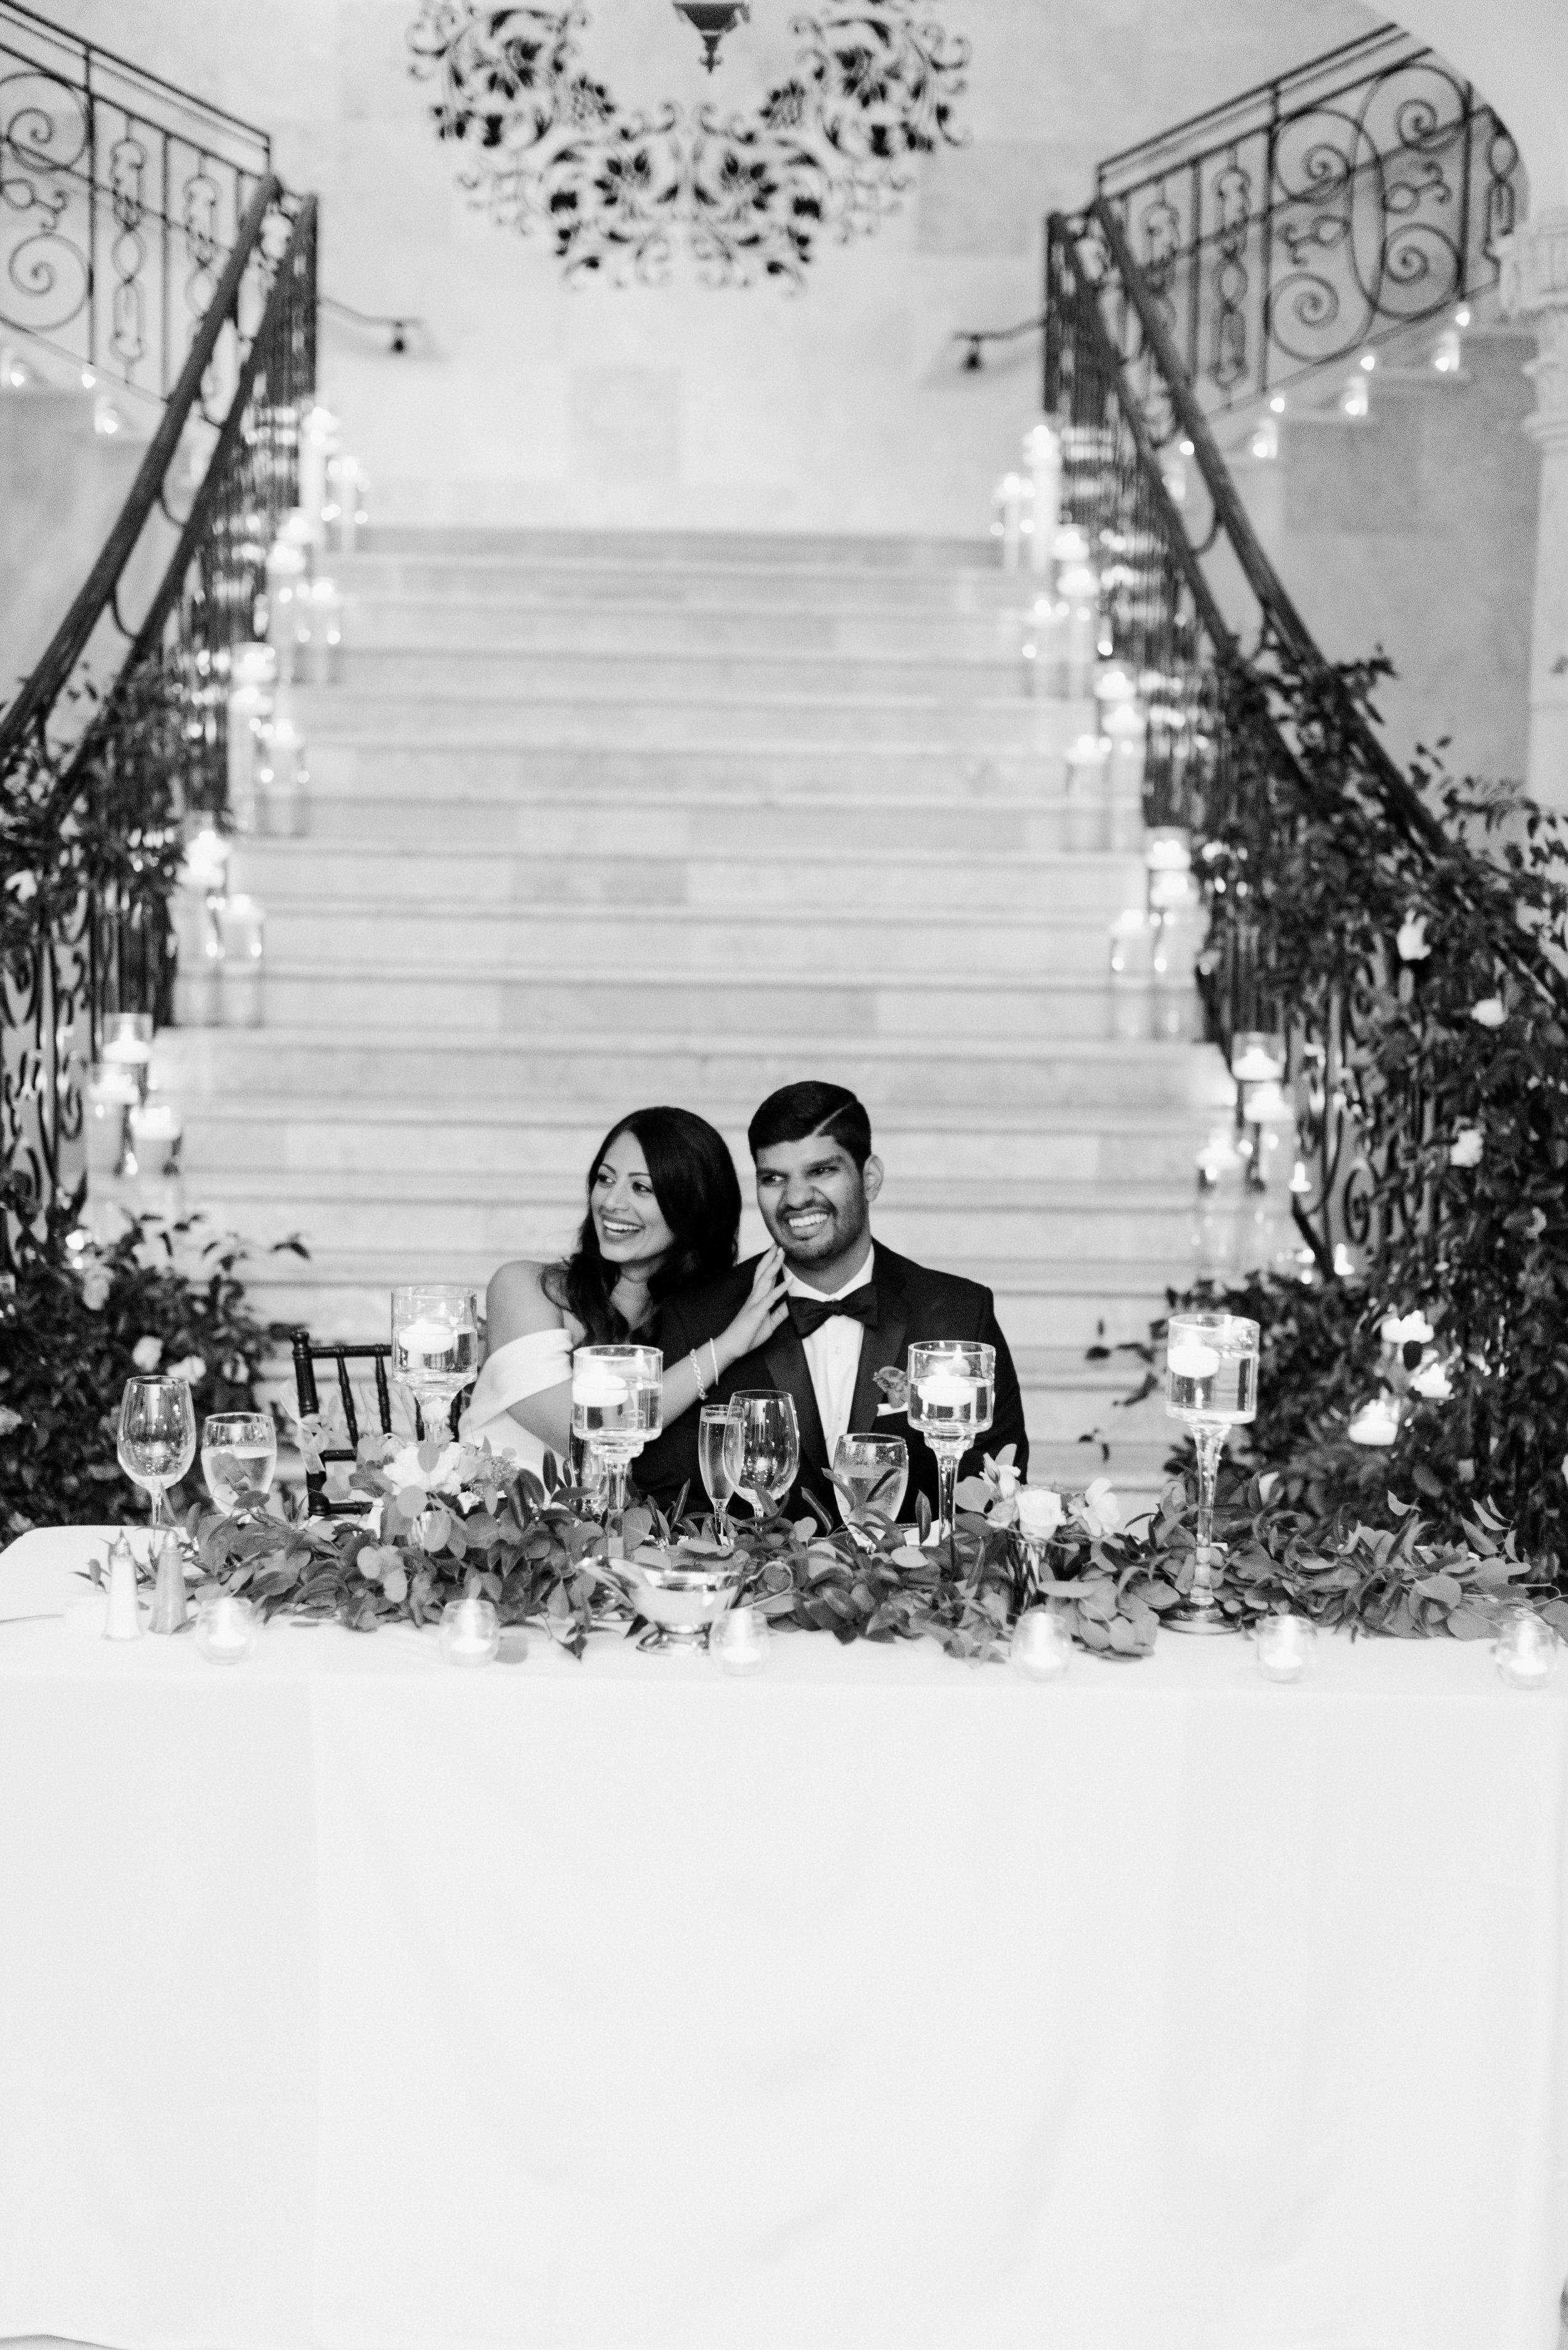 Fine-Art-Film-Houston-Wedding-Photographer-Best-Top-Luxury-Texas-Austin-Dallas-Destination-Dana-Fernandez-Photography-The-Bell-Tower-on-34th-Indian-38.jpg